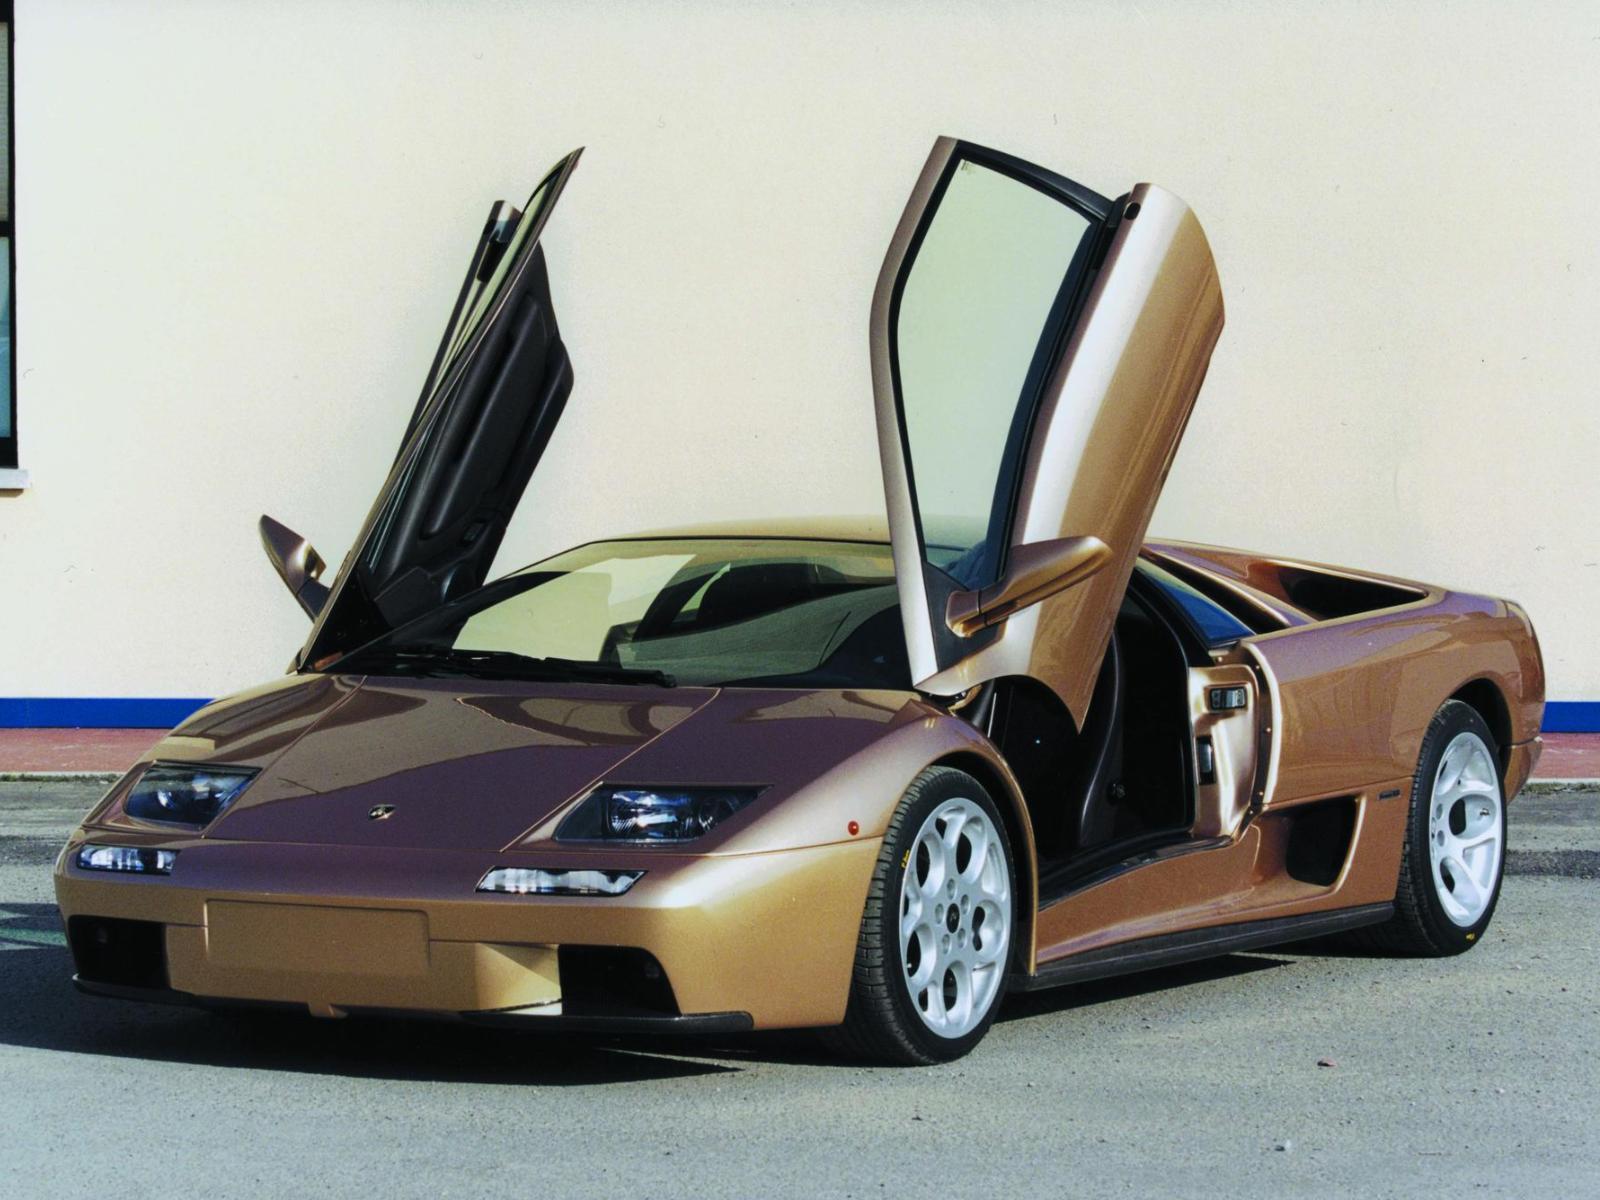 Wallpapers For Lamborghini Cars Pc